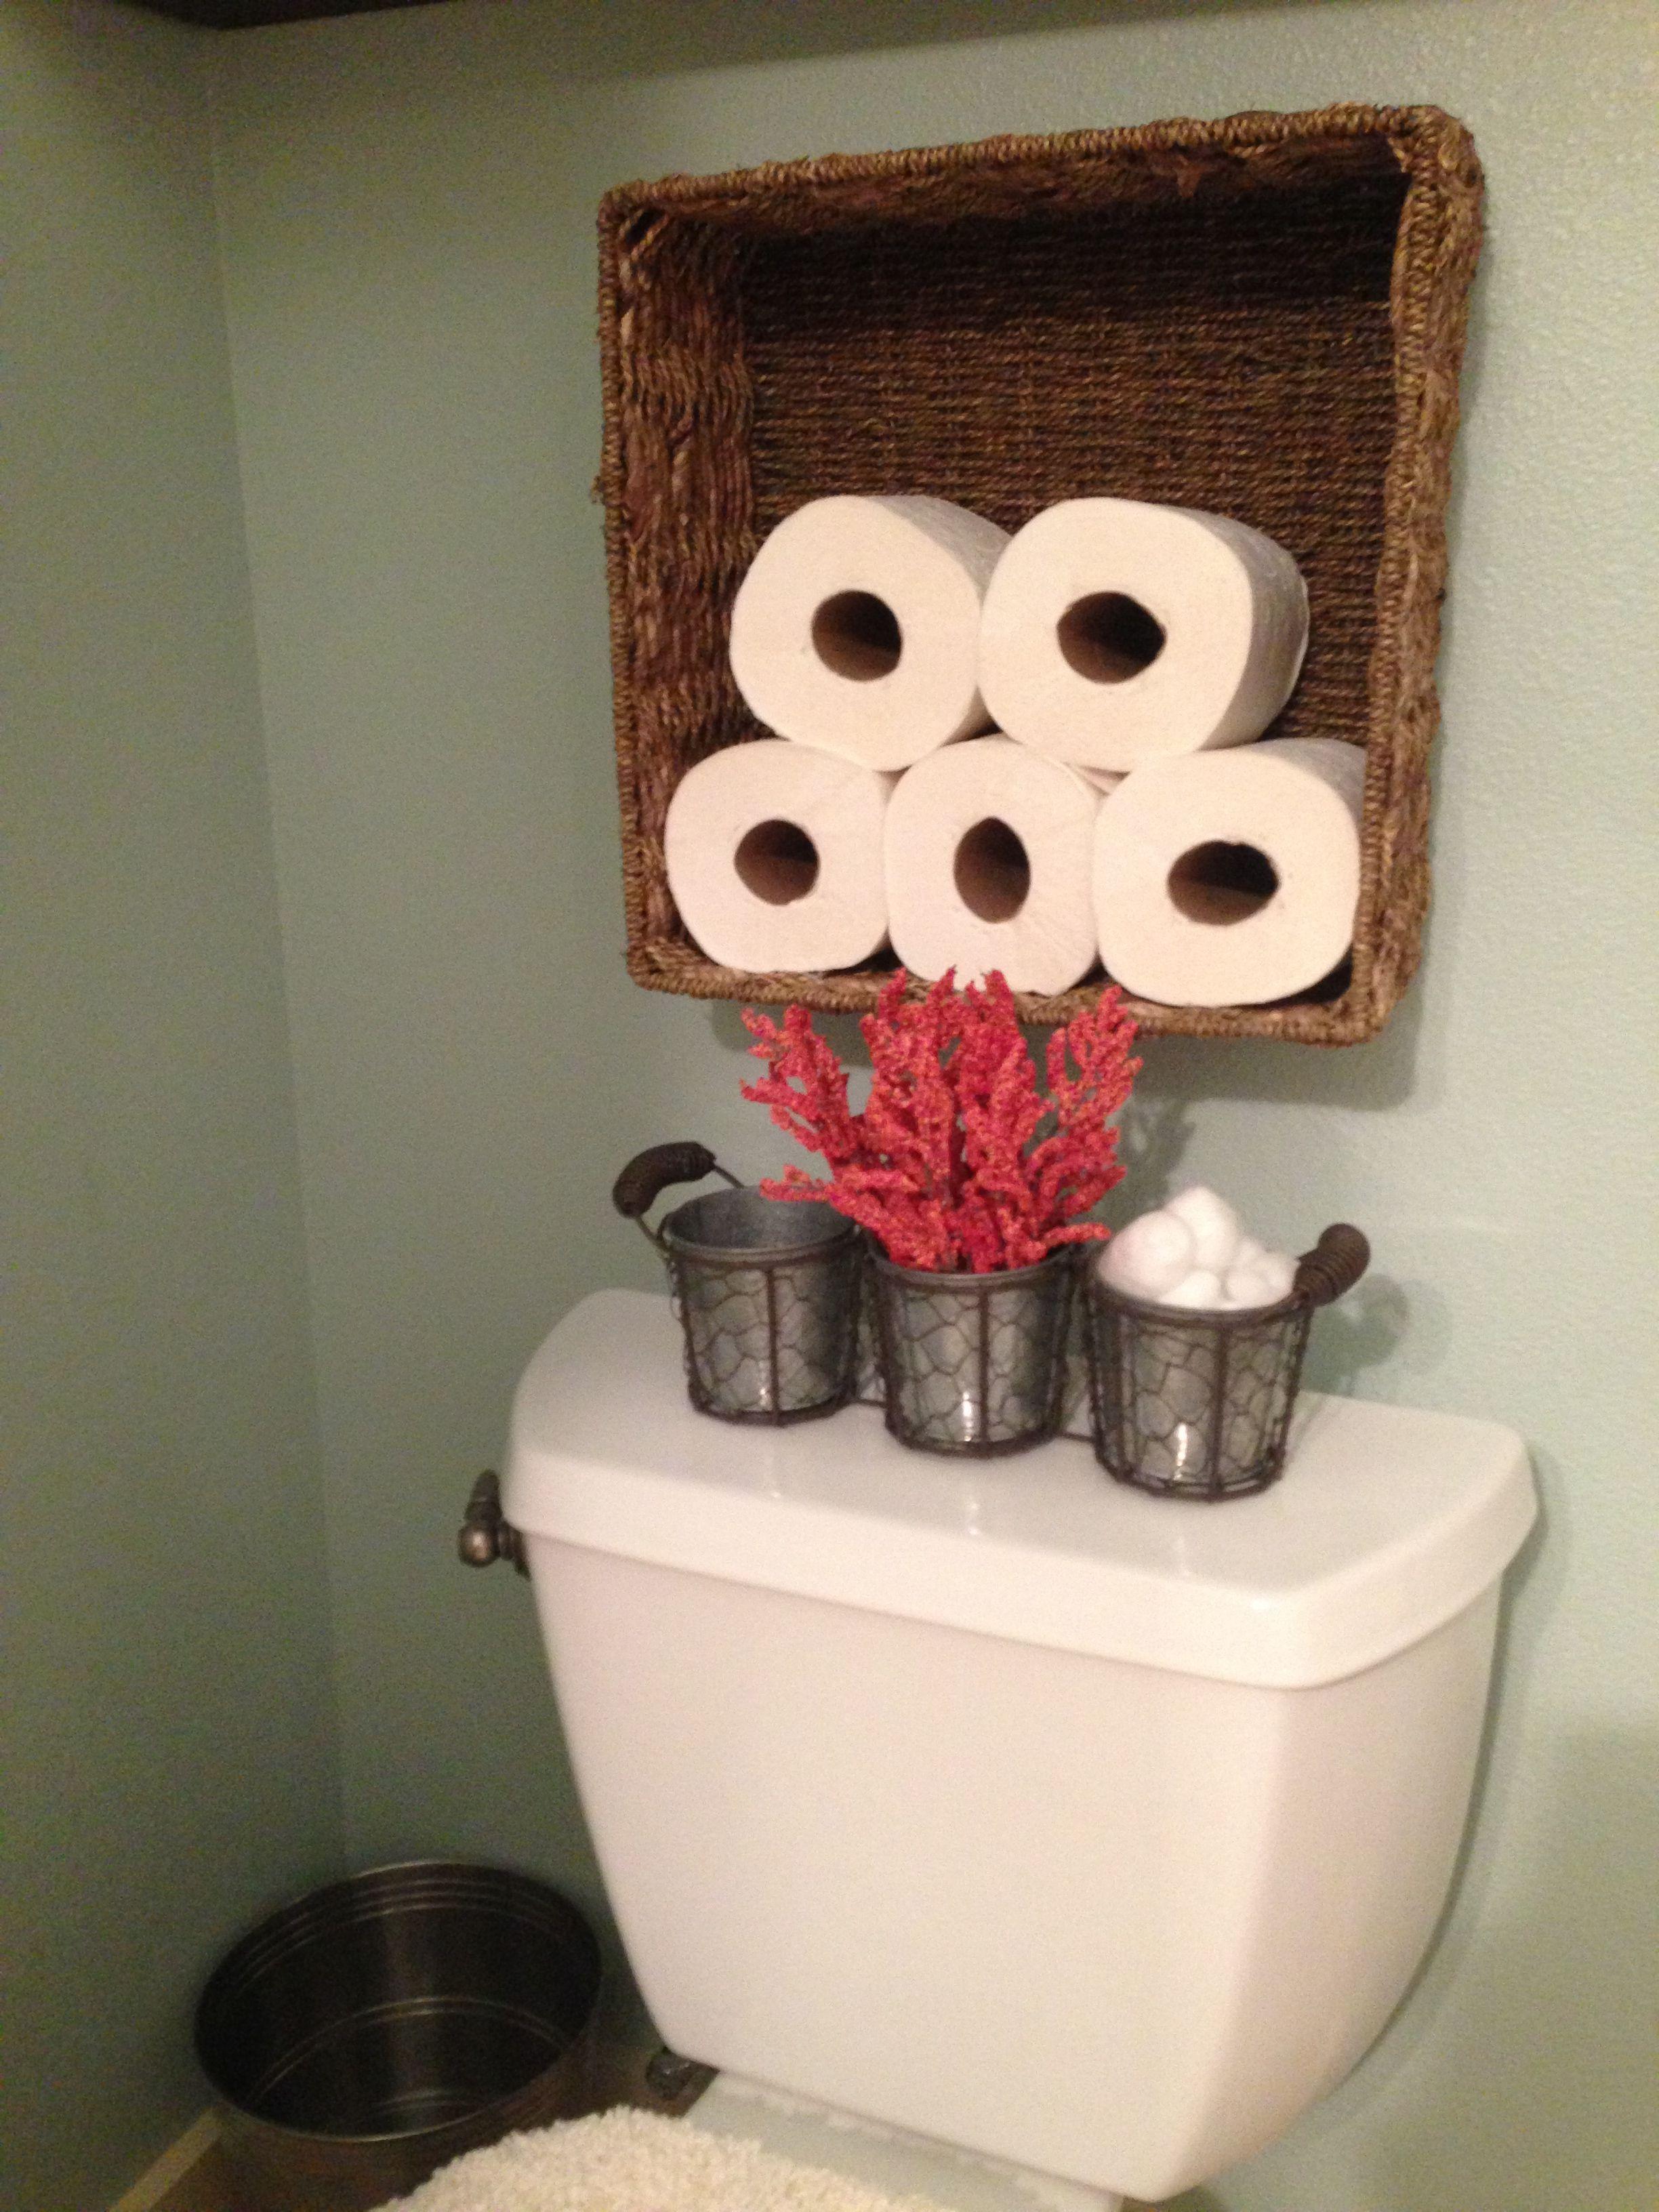 Toilet Paper Storage Toilet Paper Storage Toilet Paper Paper